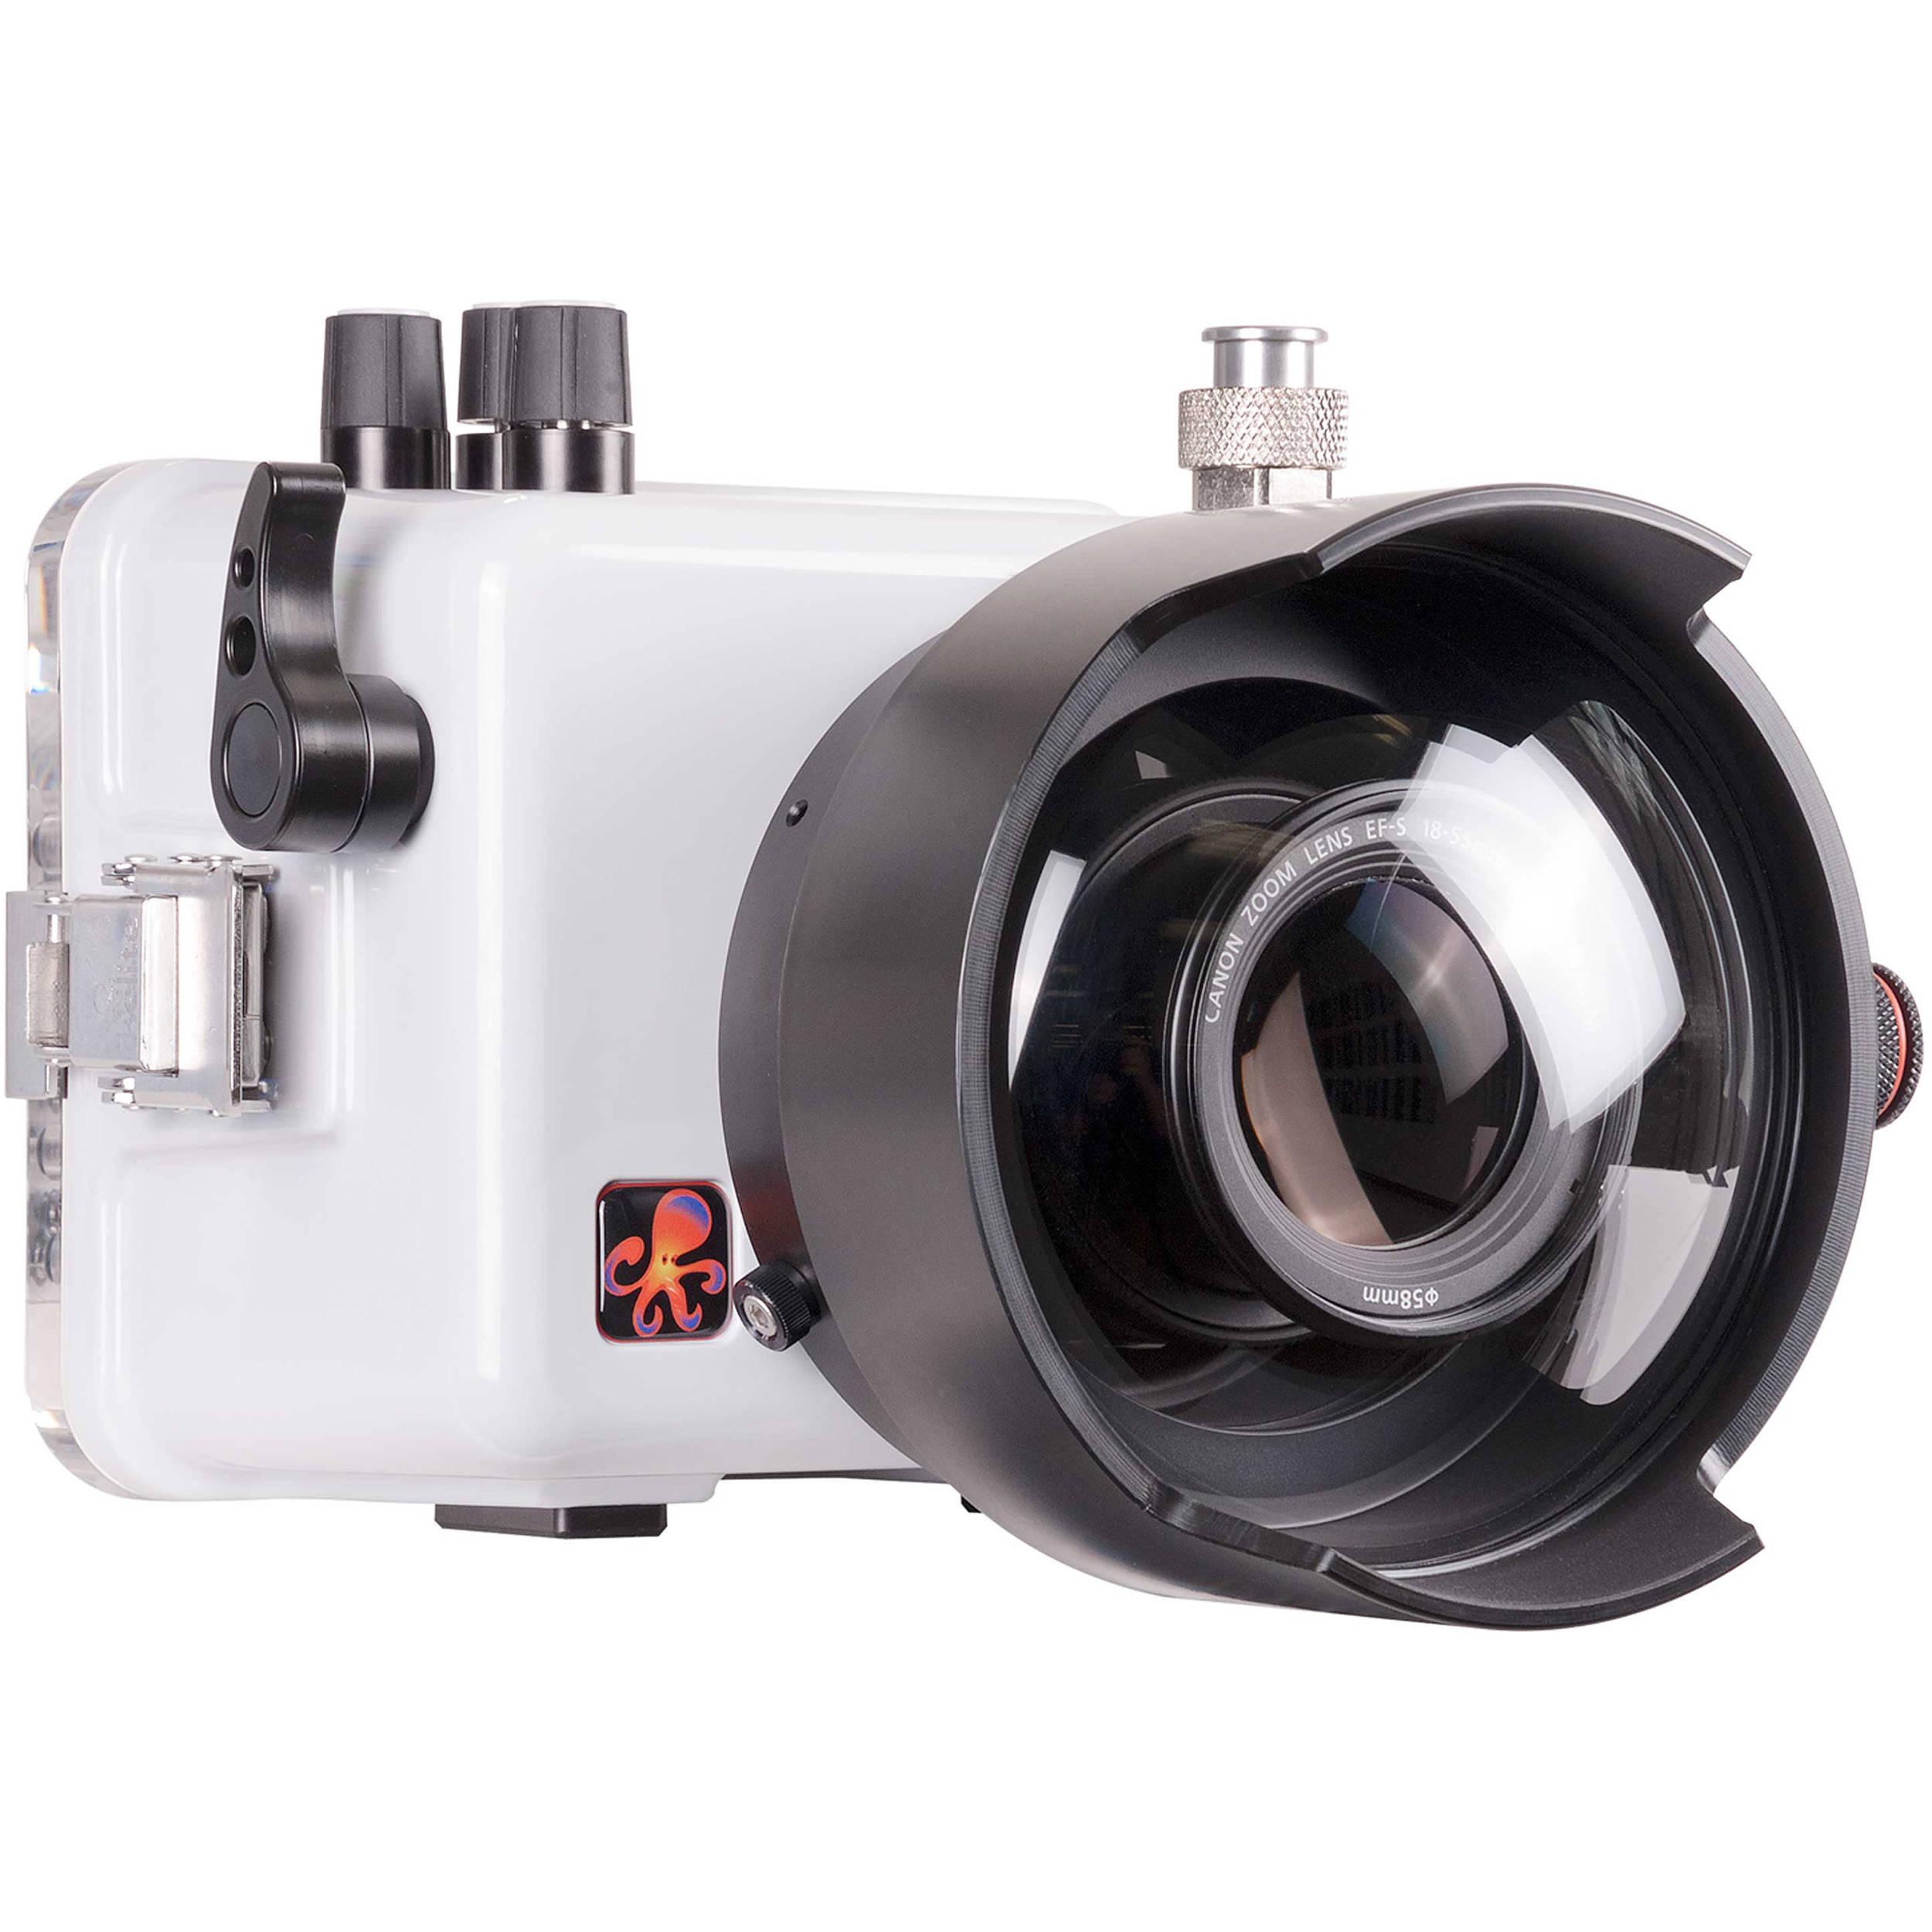 Ikelite 200DLM/C Underwater TTL Housing for Canon EOS Rebel SL2 with 6